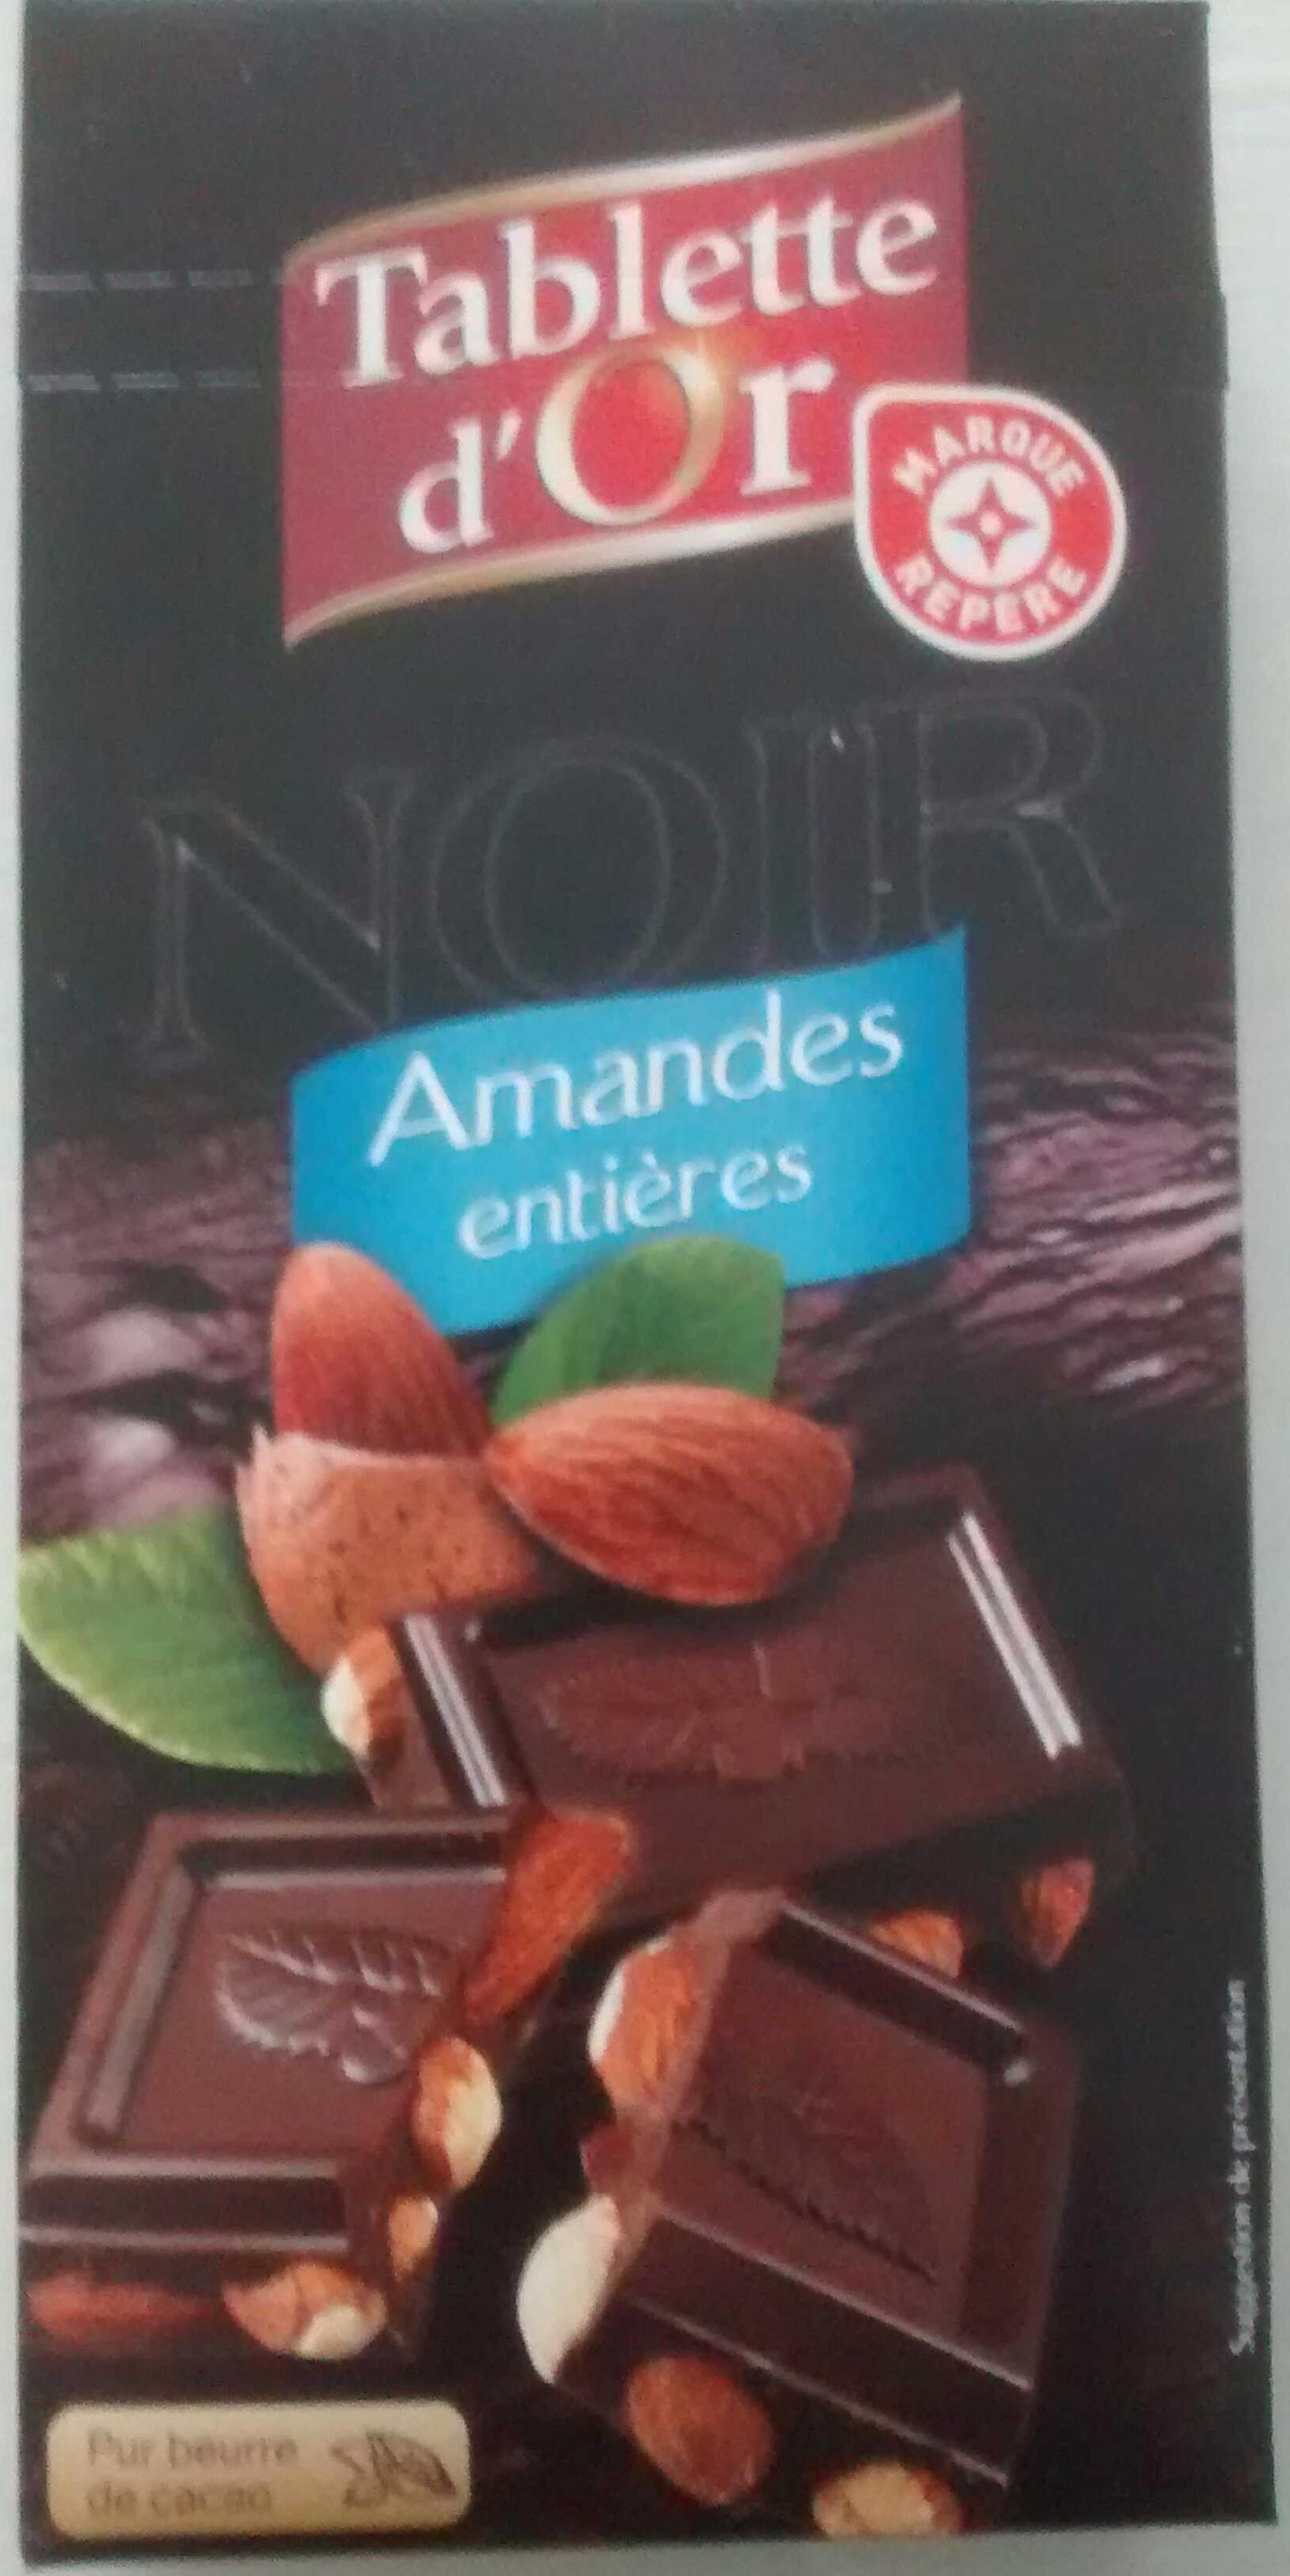 chocolat noir amandes enti res tablette d 39 or 200 g. Black Bedroom Furniture Sets. Home Design Ideas